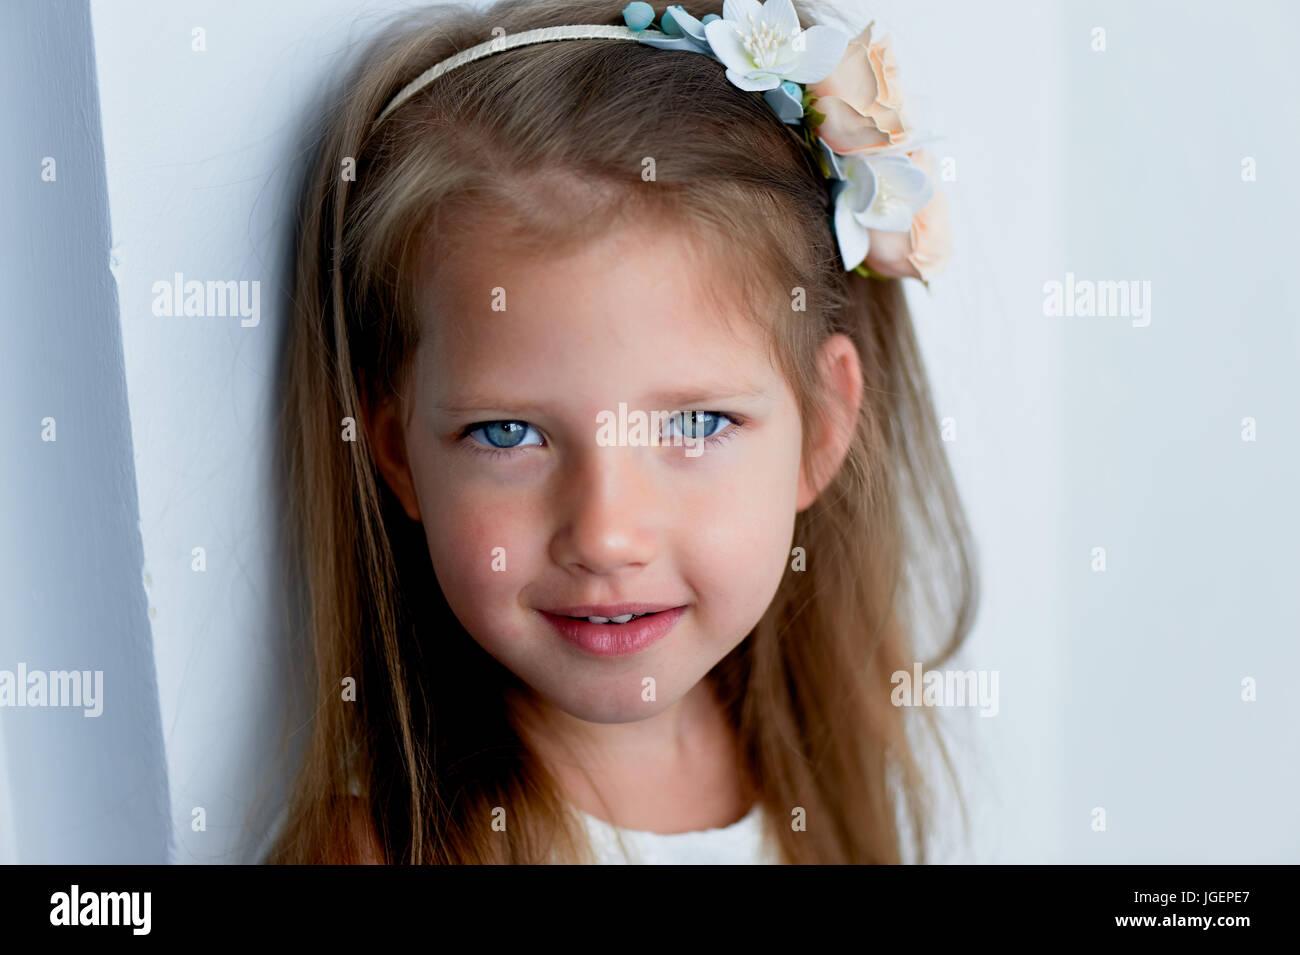 Beautiful Baby Girl Brown Hair Imágenes De Stock   Beautiful Baby ... 9cd8e00d266a